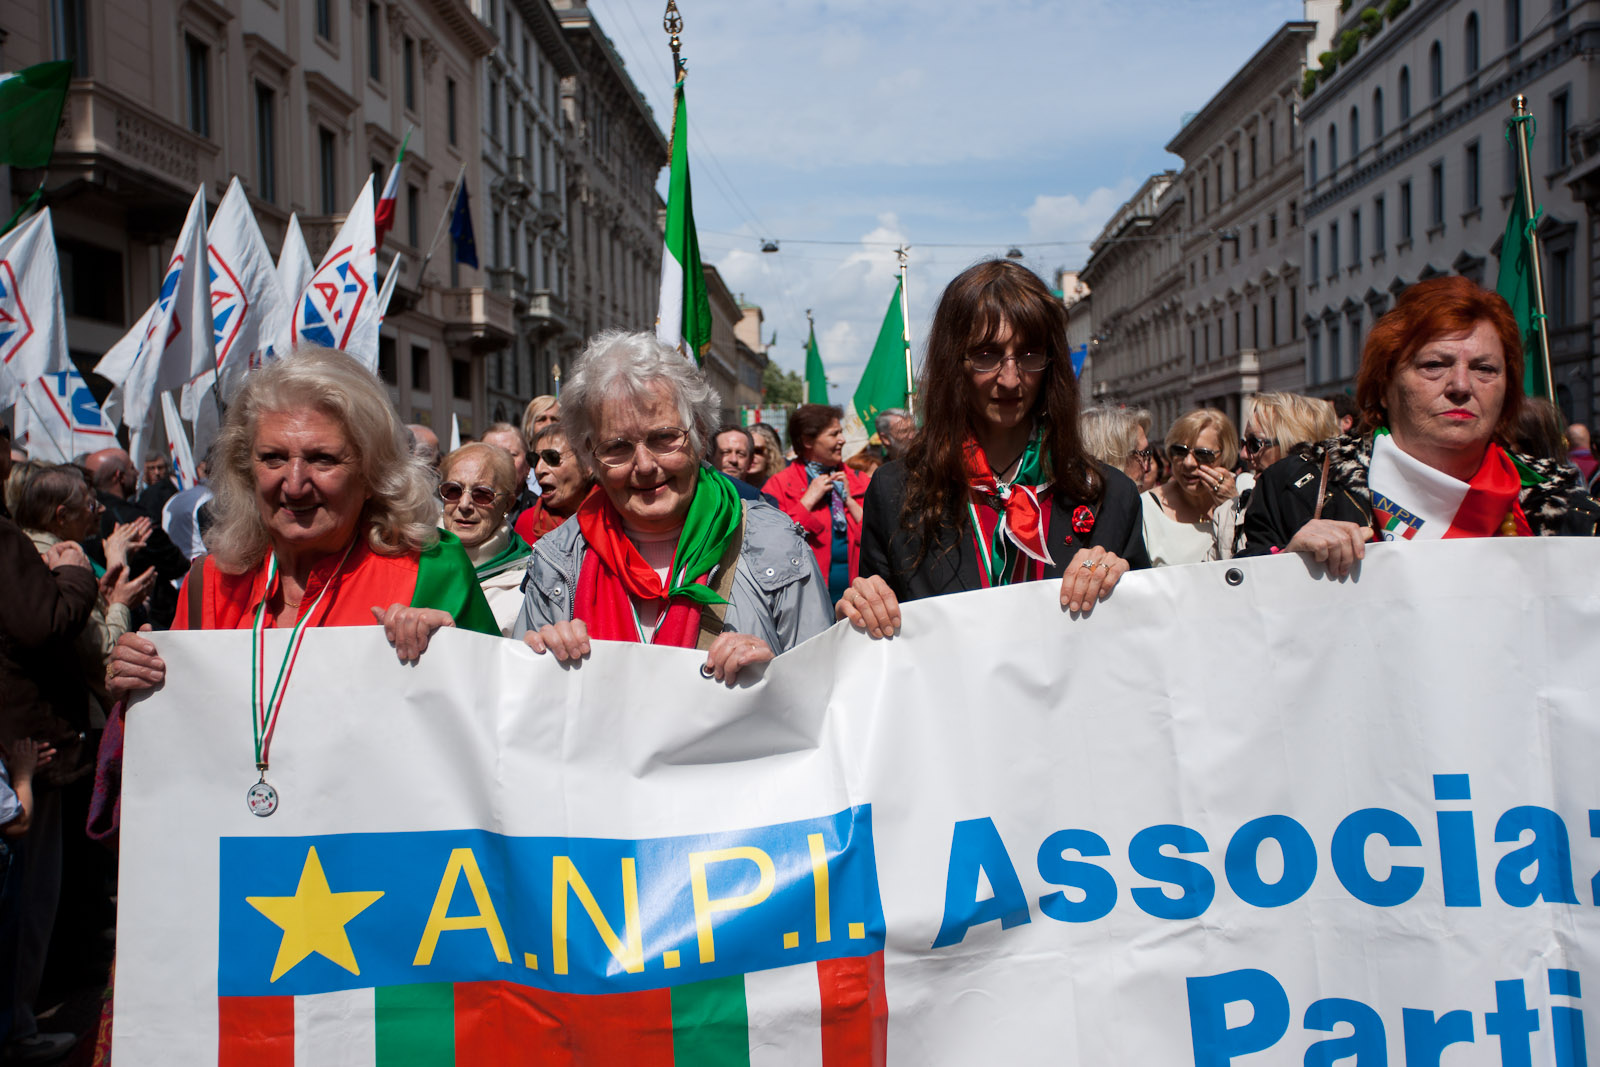 07 - ANPI (National Italian Partisans Organisation)